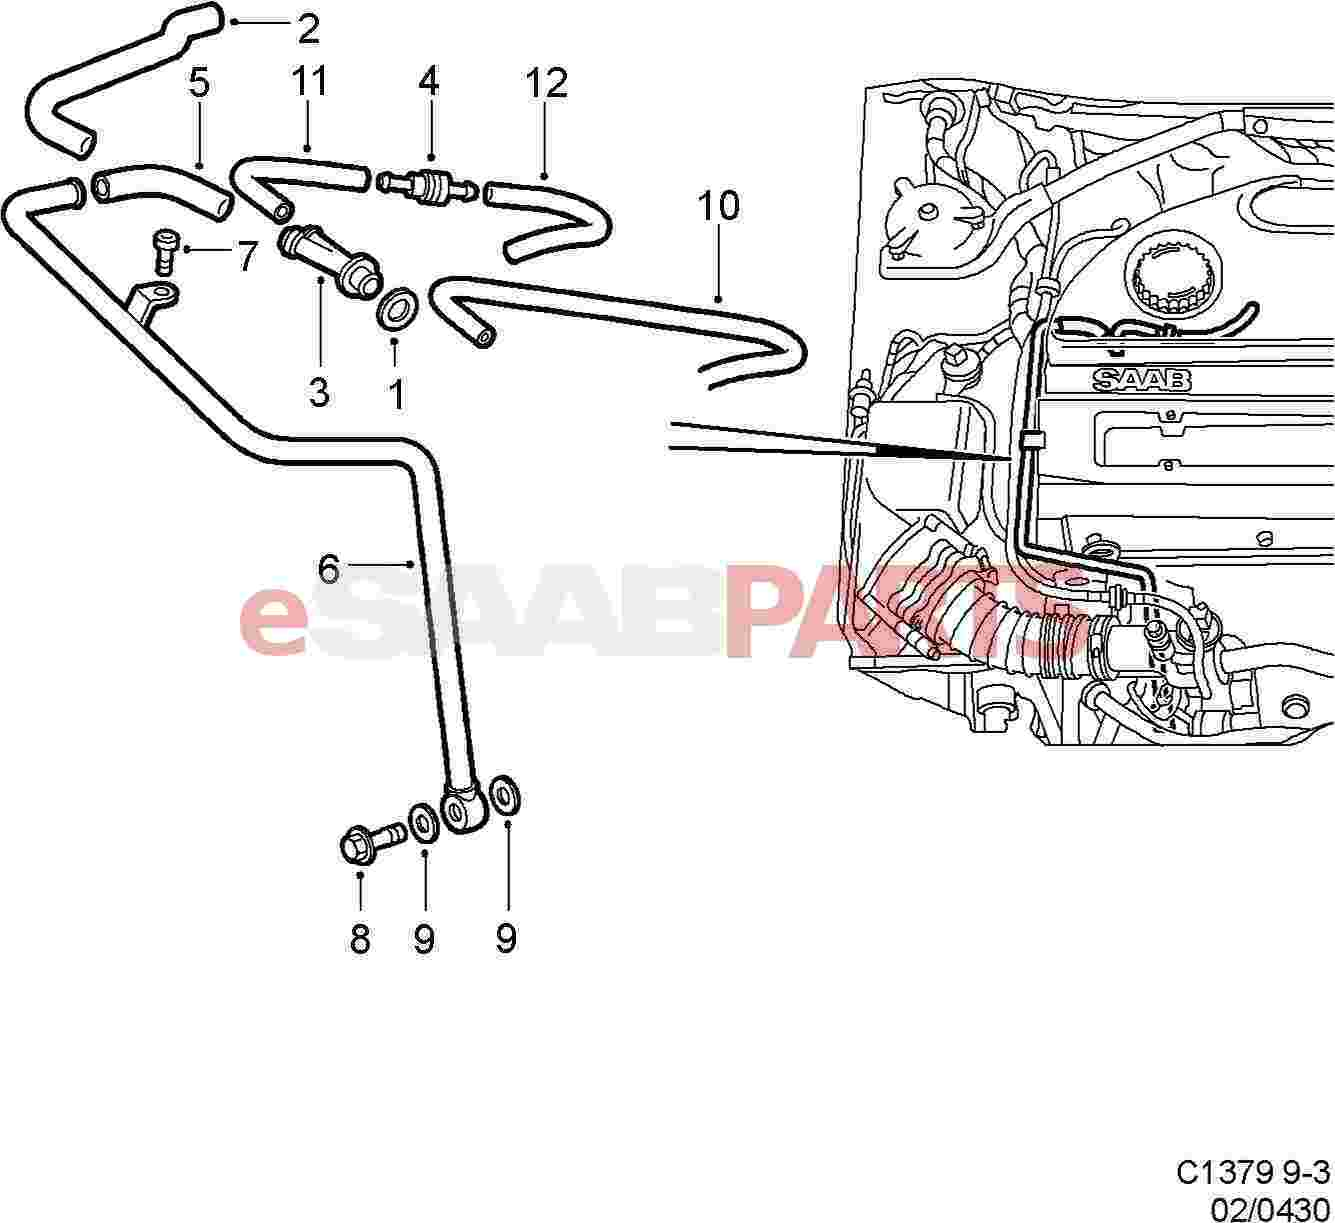 [9189564] SAAB Positive Crankcase Ventilation Valve